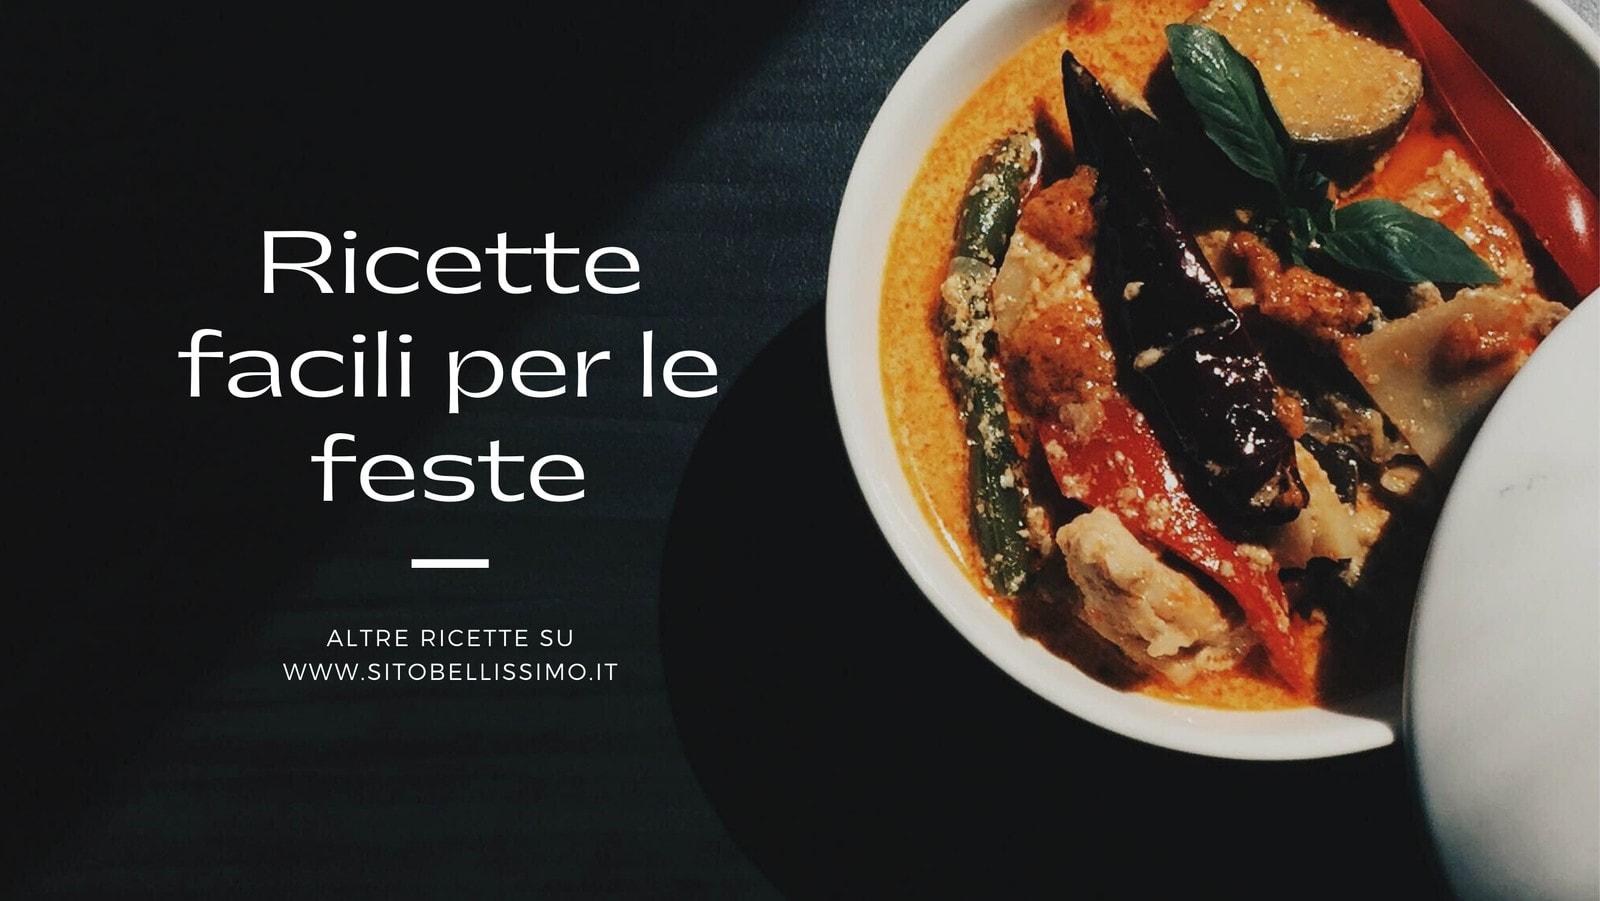 Copertina di Facebook bianca e nera semplice per cibo